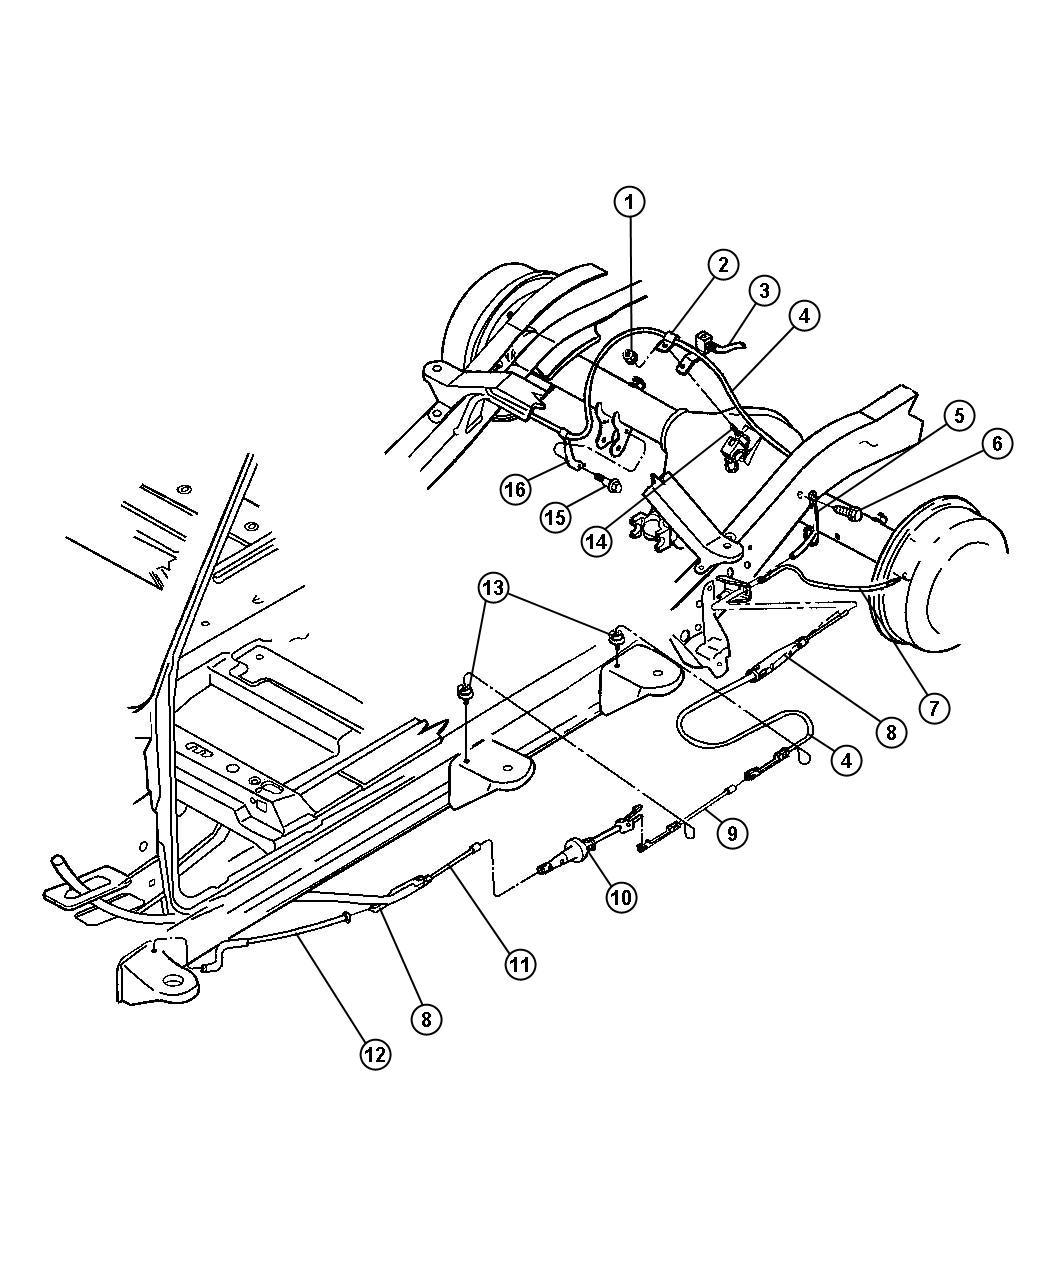 2000 Dodge Dakota Tensioner. Parking brake cable. [bka